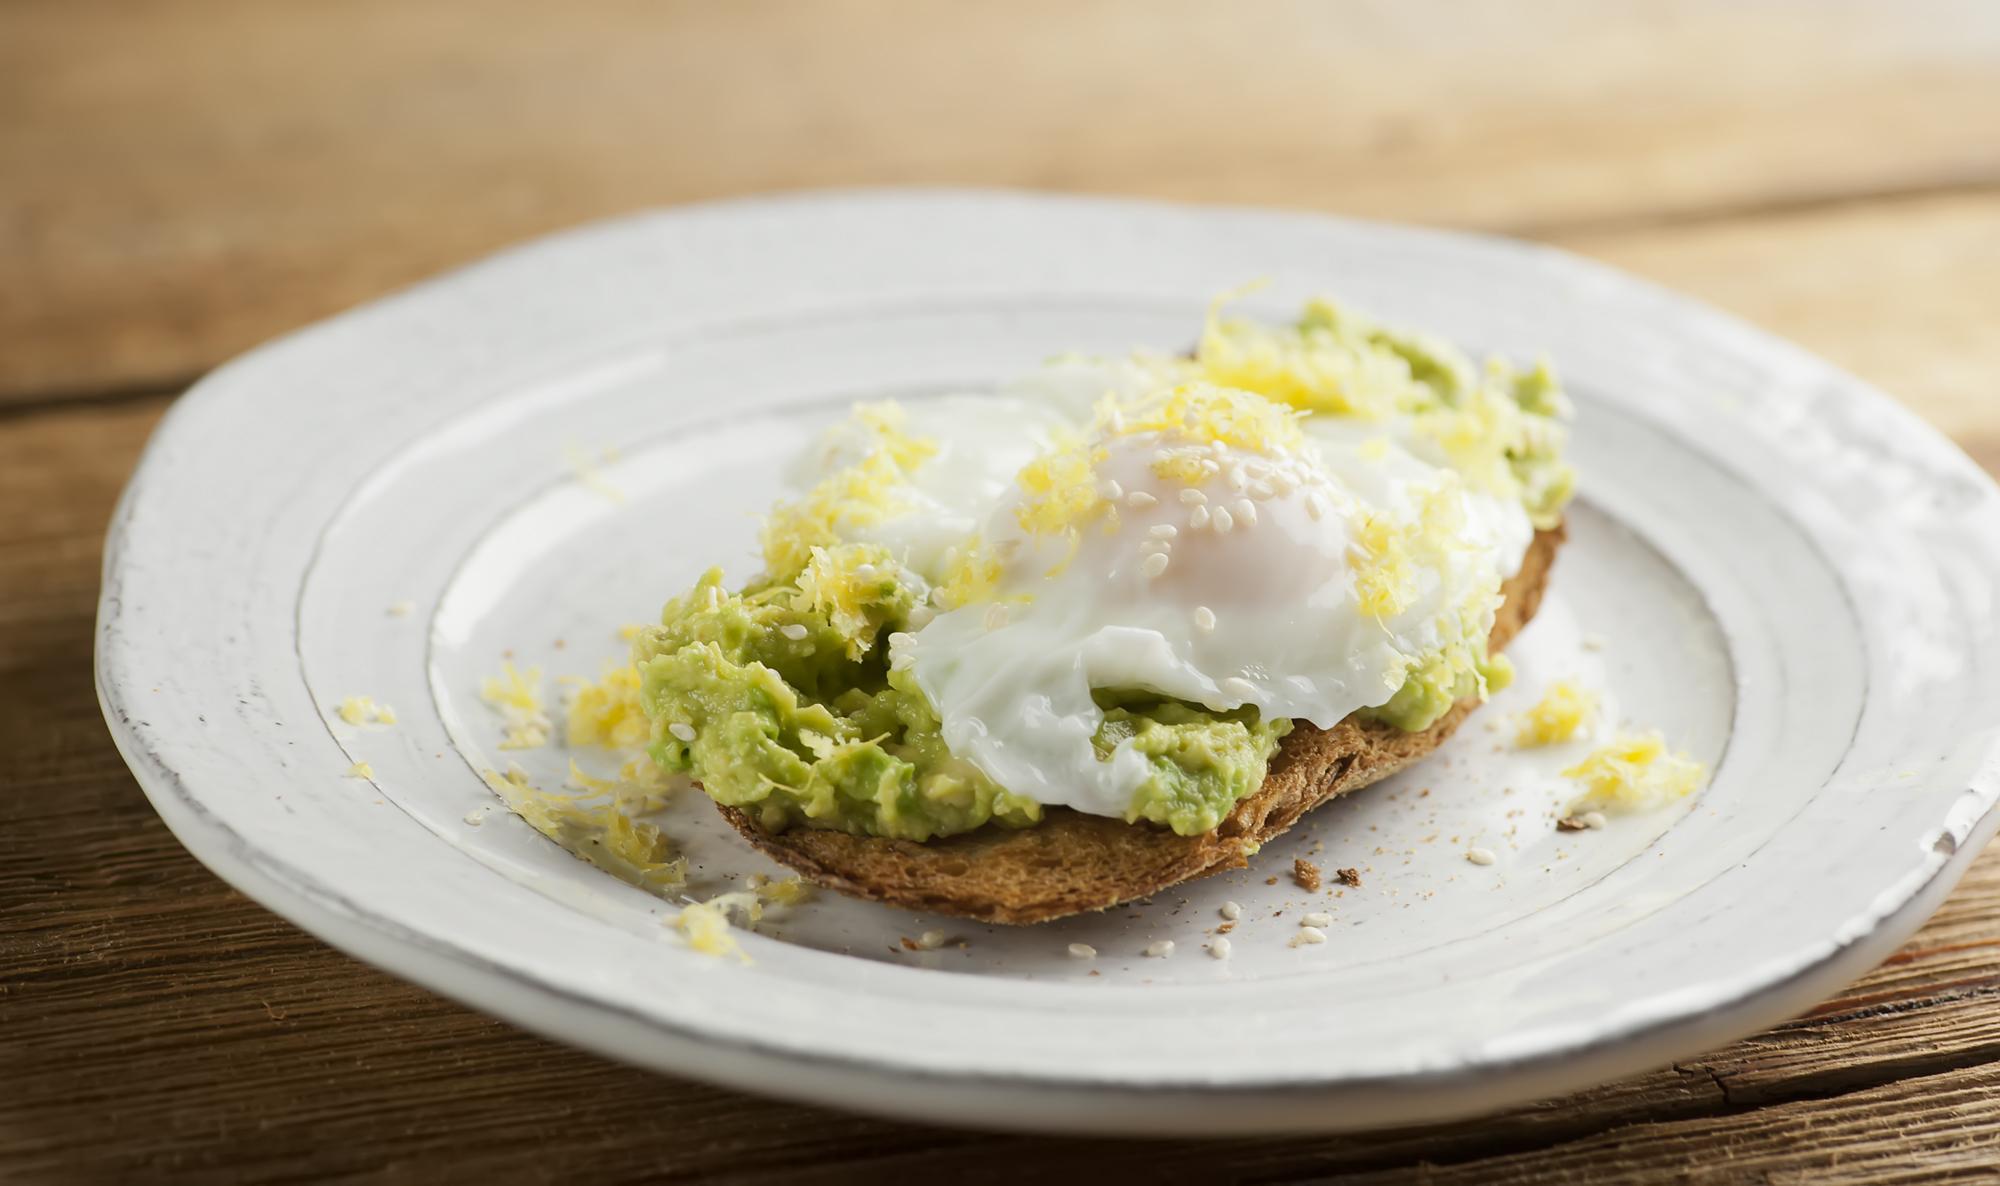 lemon avocado toast with a poached egg